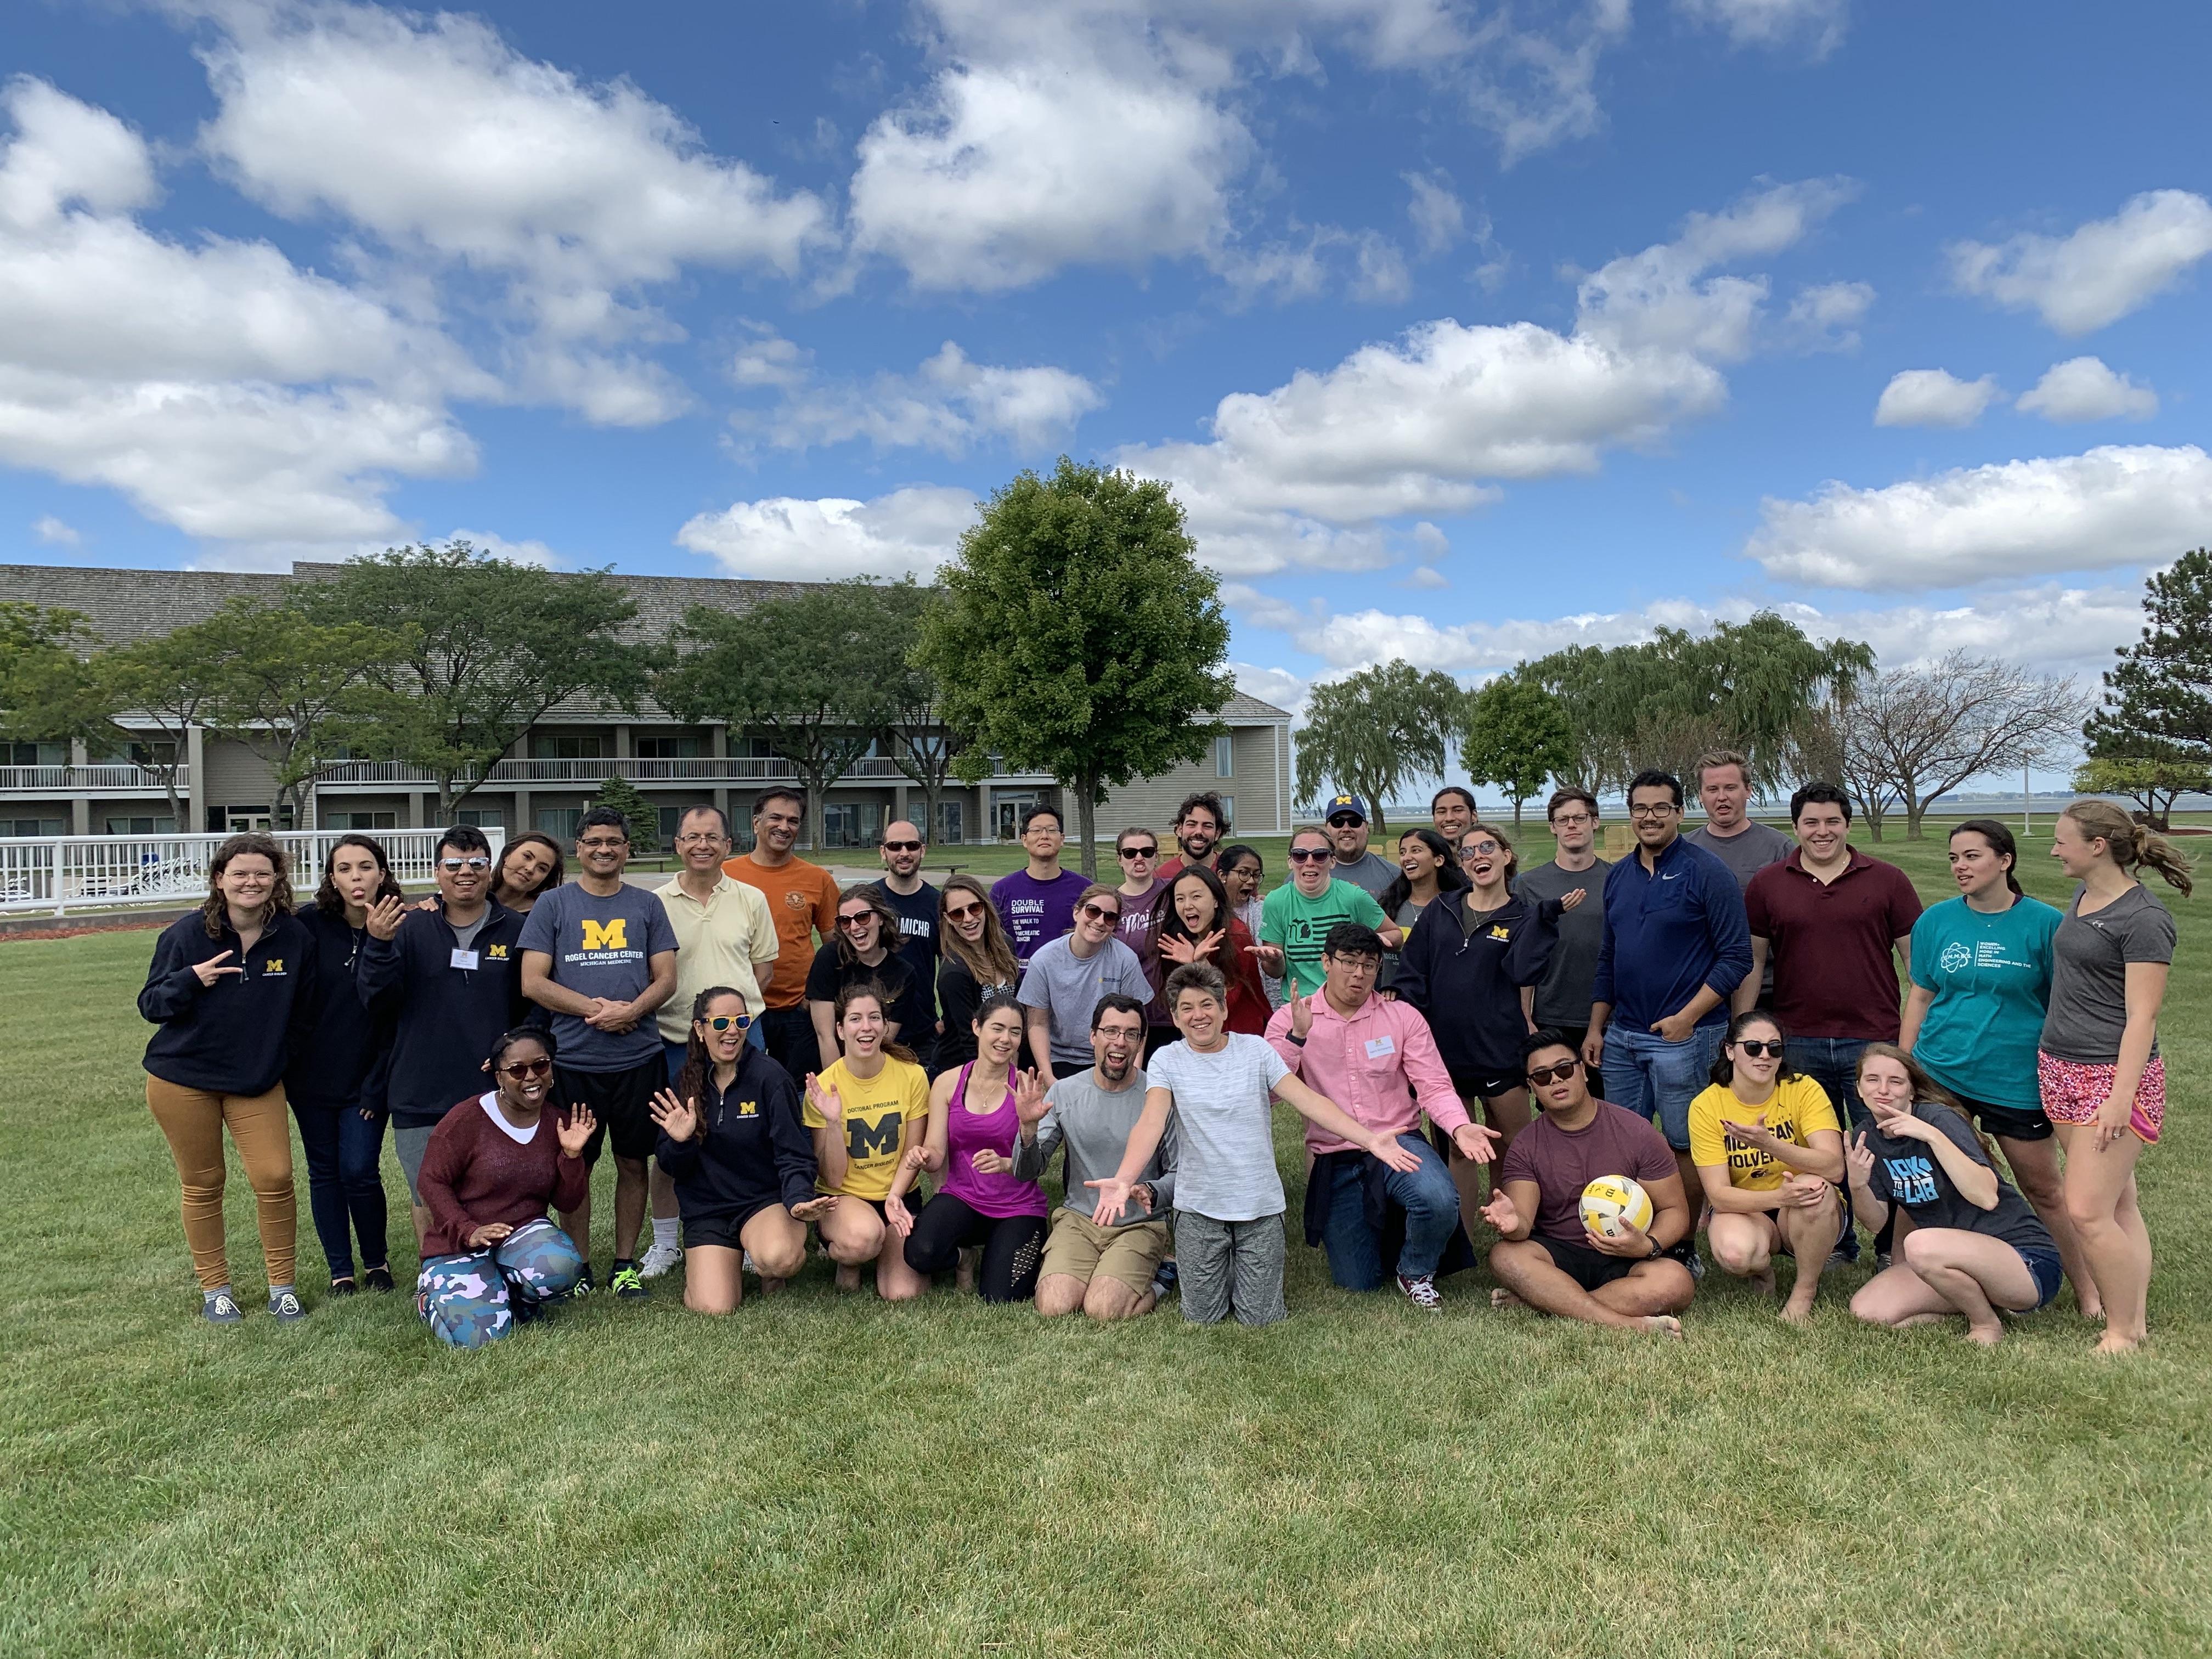 2019 CB retreat winners